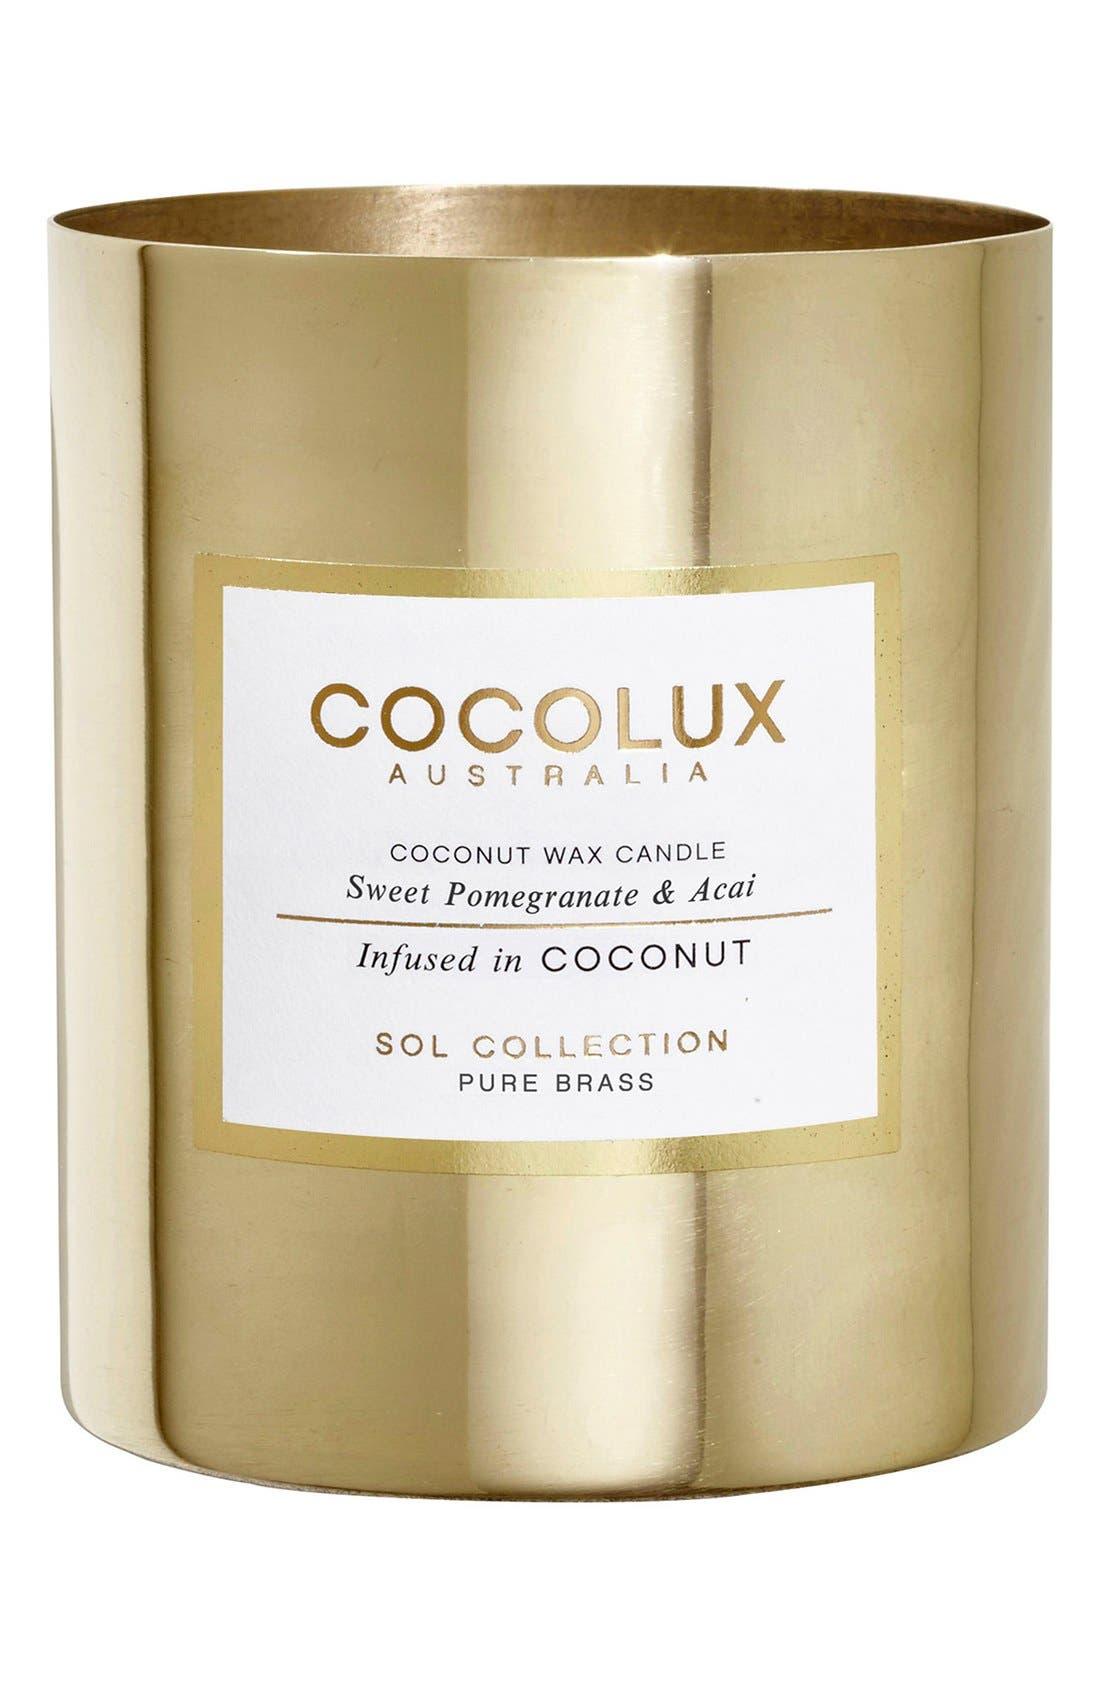 Cocolux Australia Sweet Pomegranate & Acai Brass Candle